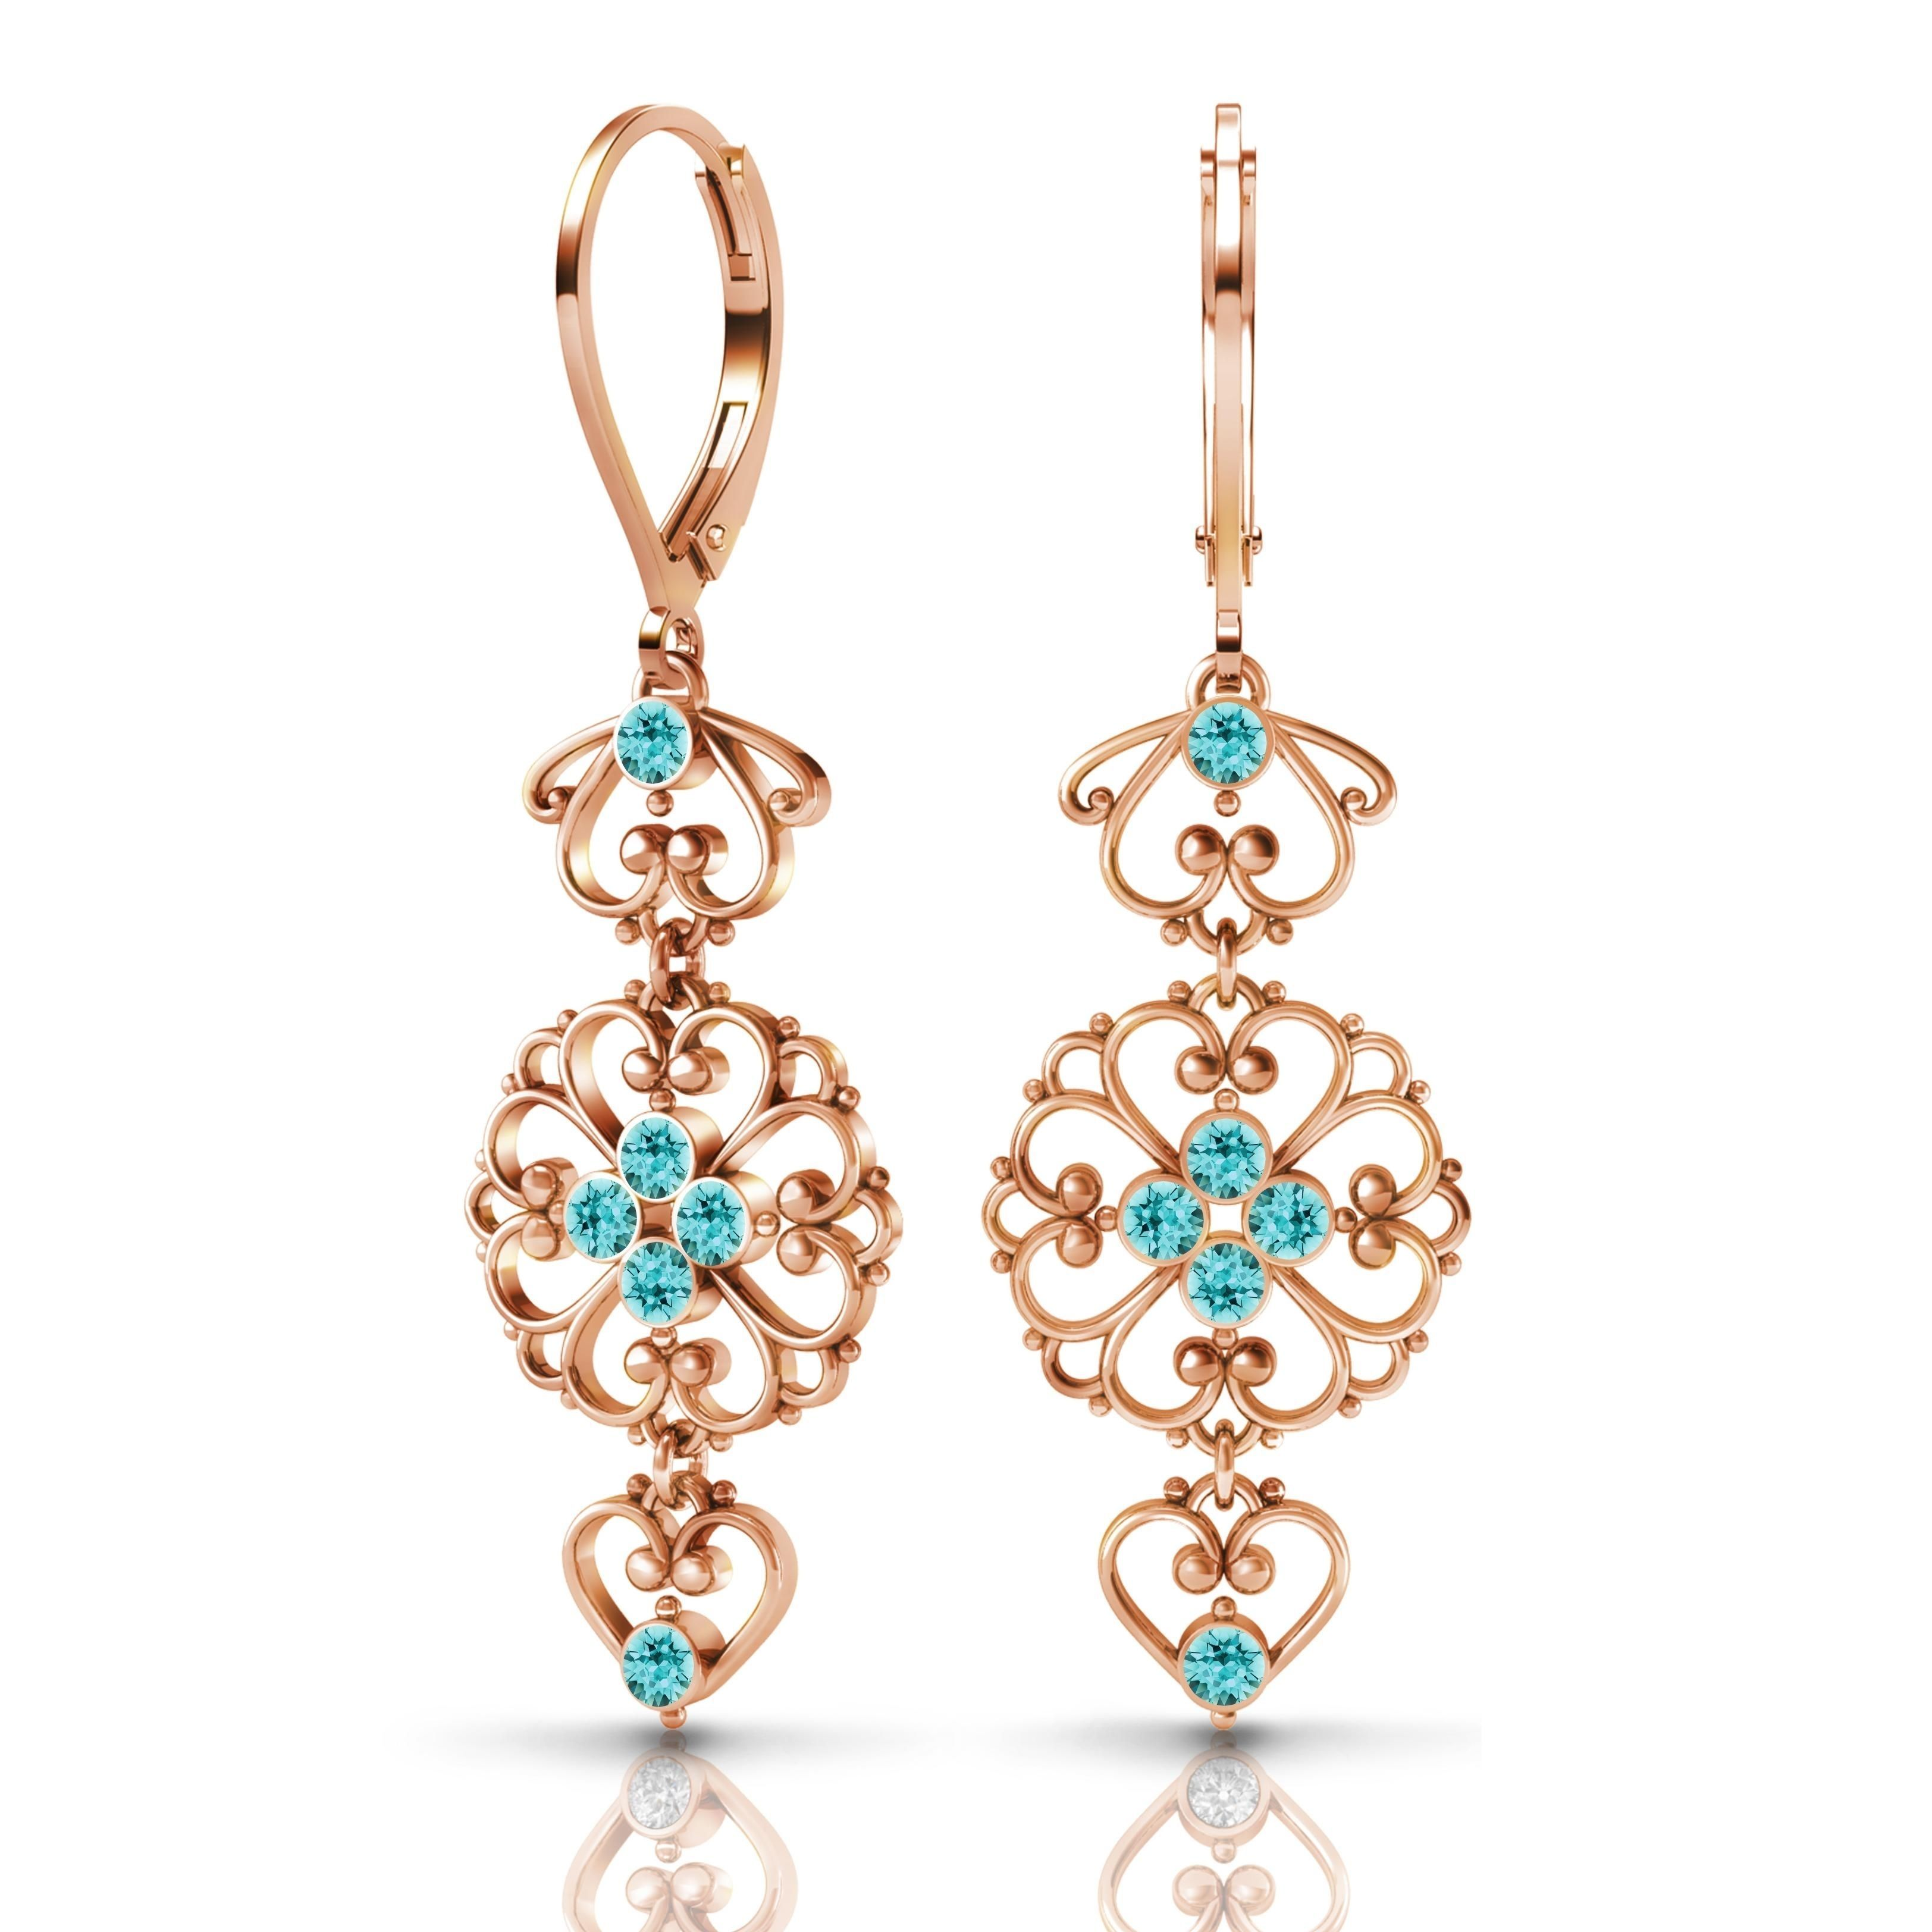 Sterling Silver Earrings by Lucia Costin Swarovski s